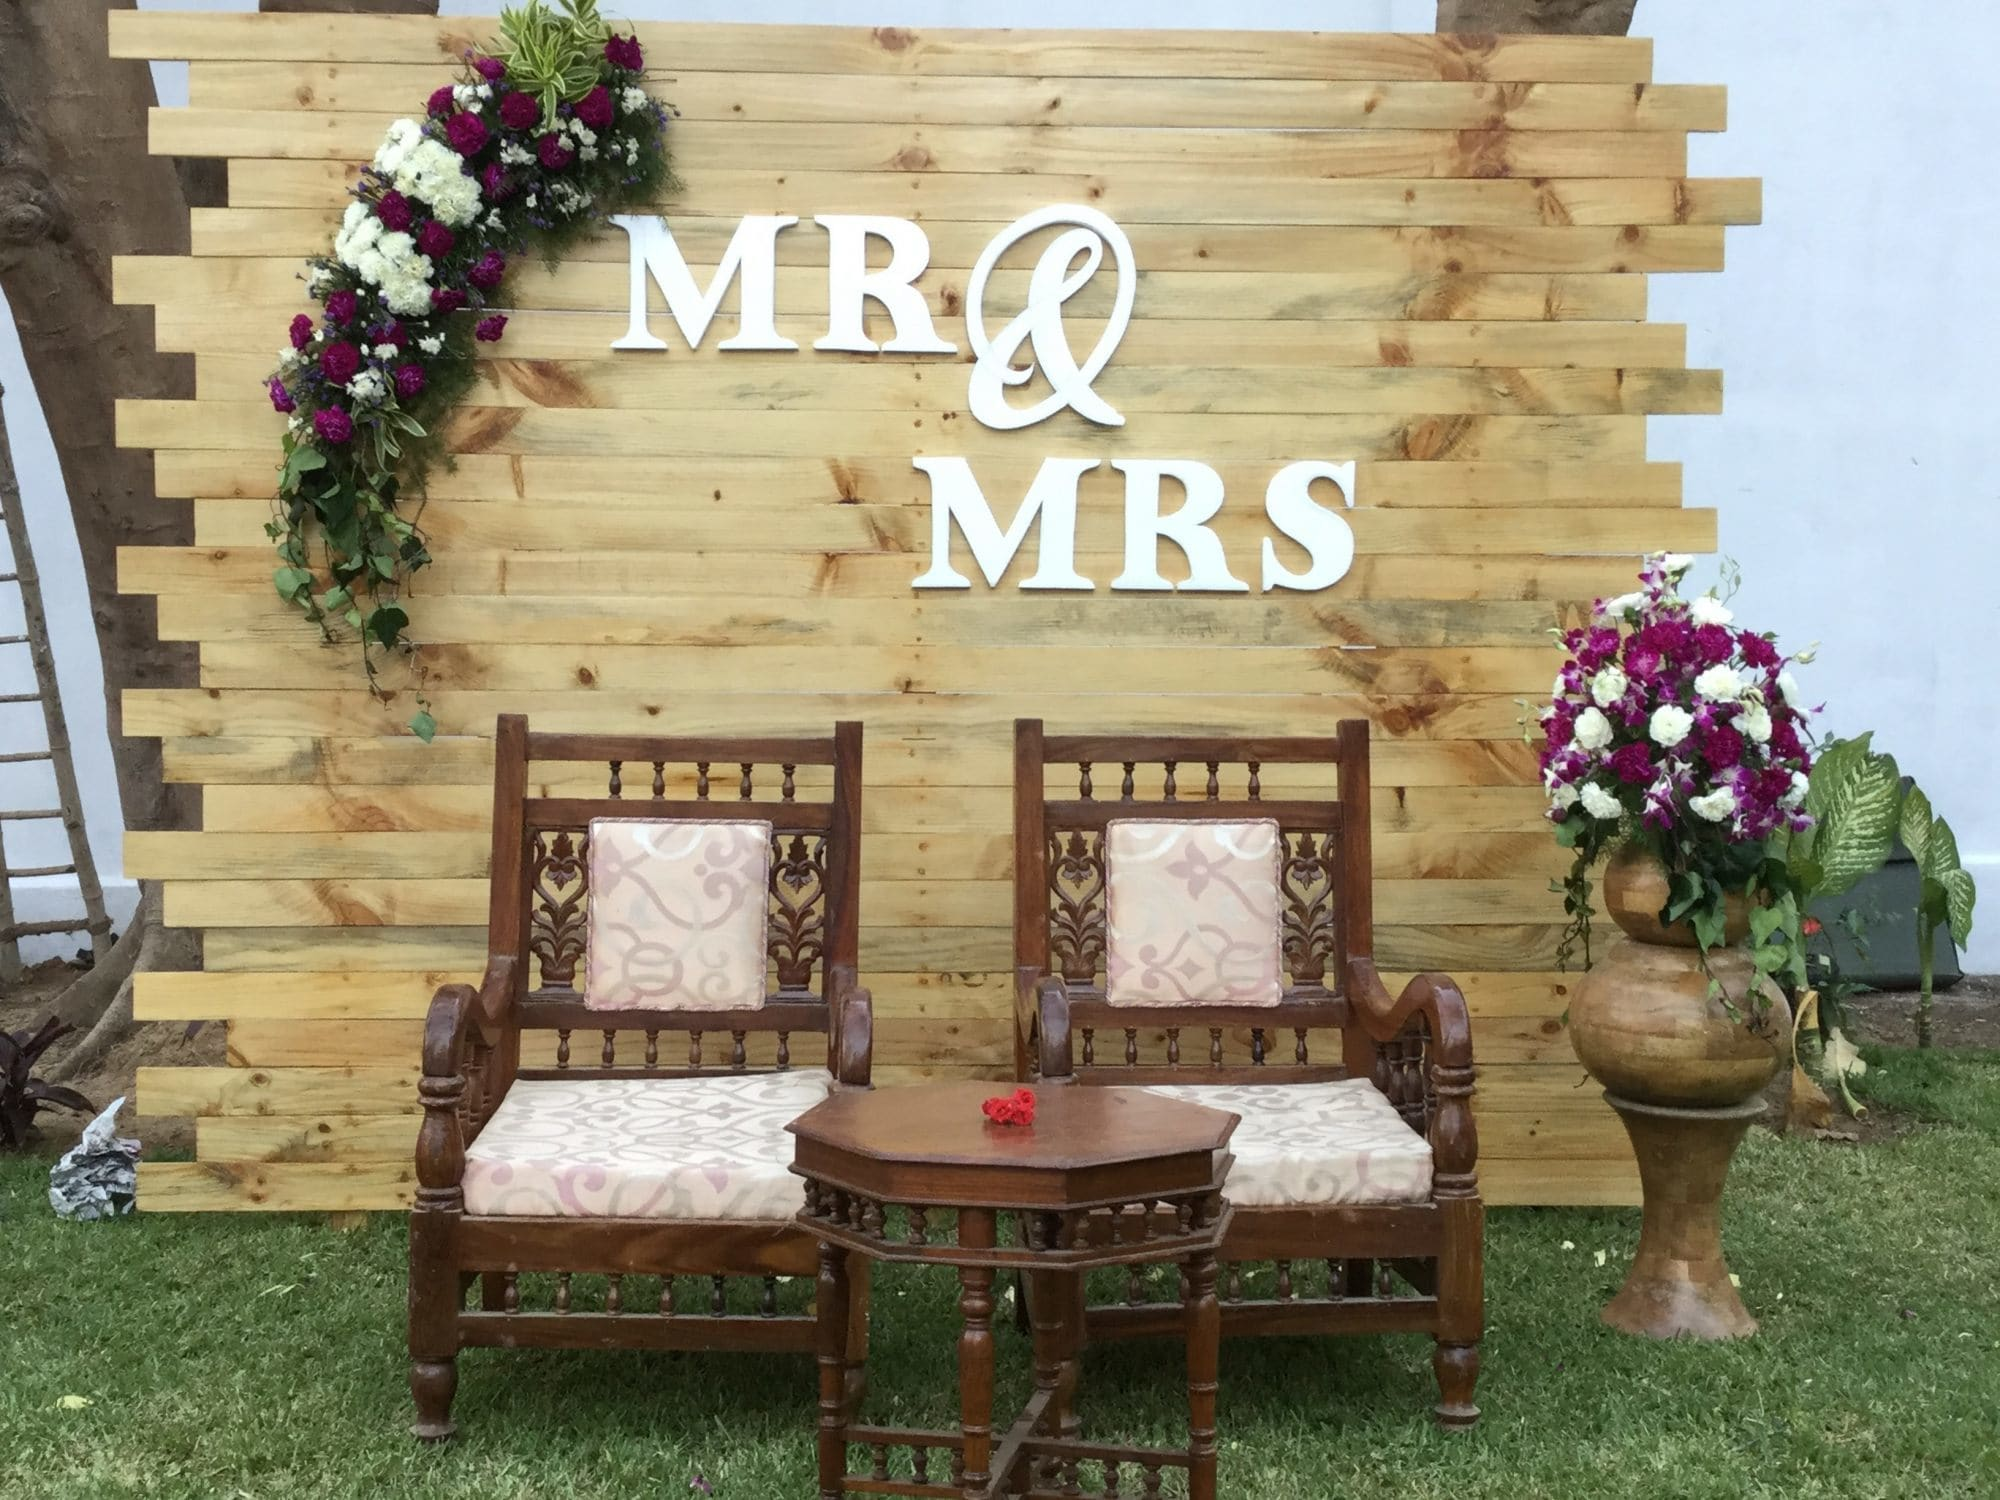 Top 100 wedding decorators in chennai best marriage decorators wedding decorators chennai junglespirit Choice Image